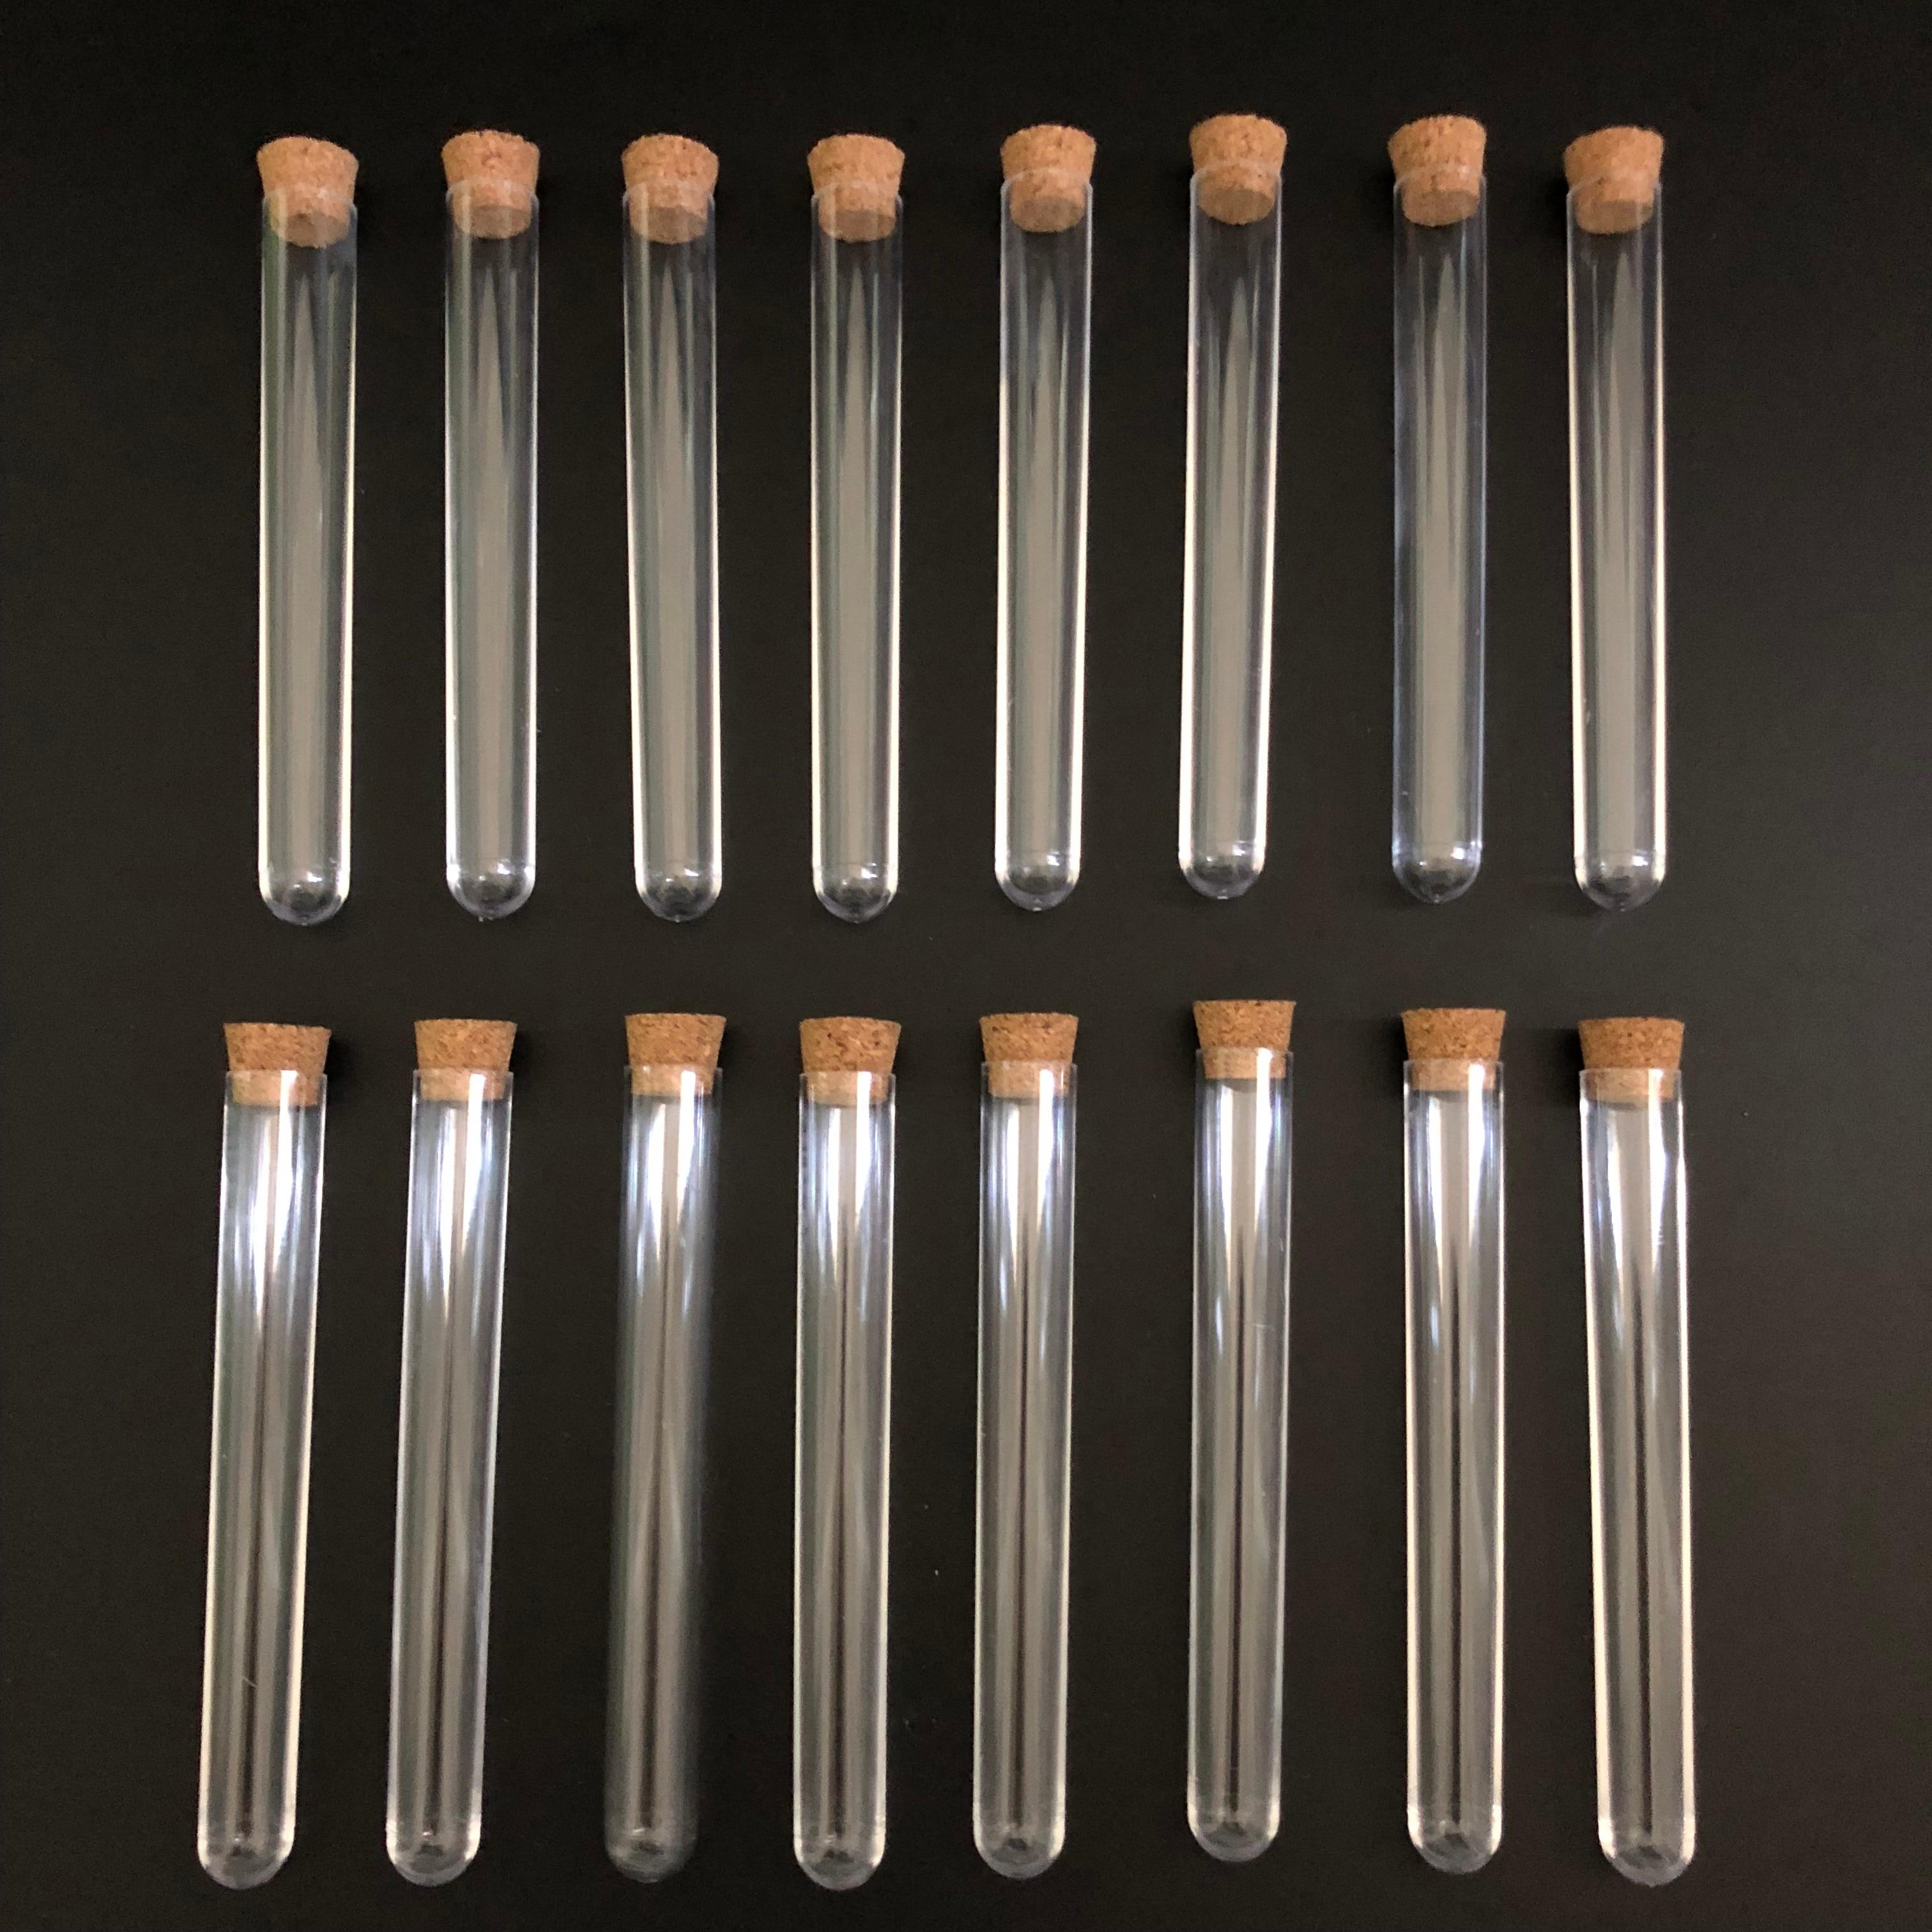 100pcs 12x100mm Clear Plastic Test Tubes With Corks Plastic Laboratory Test Round Tube Plug Lab Transparent Plastic Tubes Vial